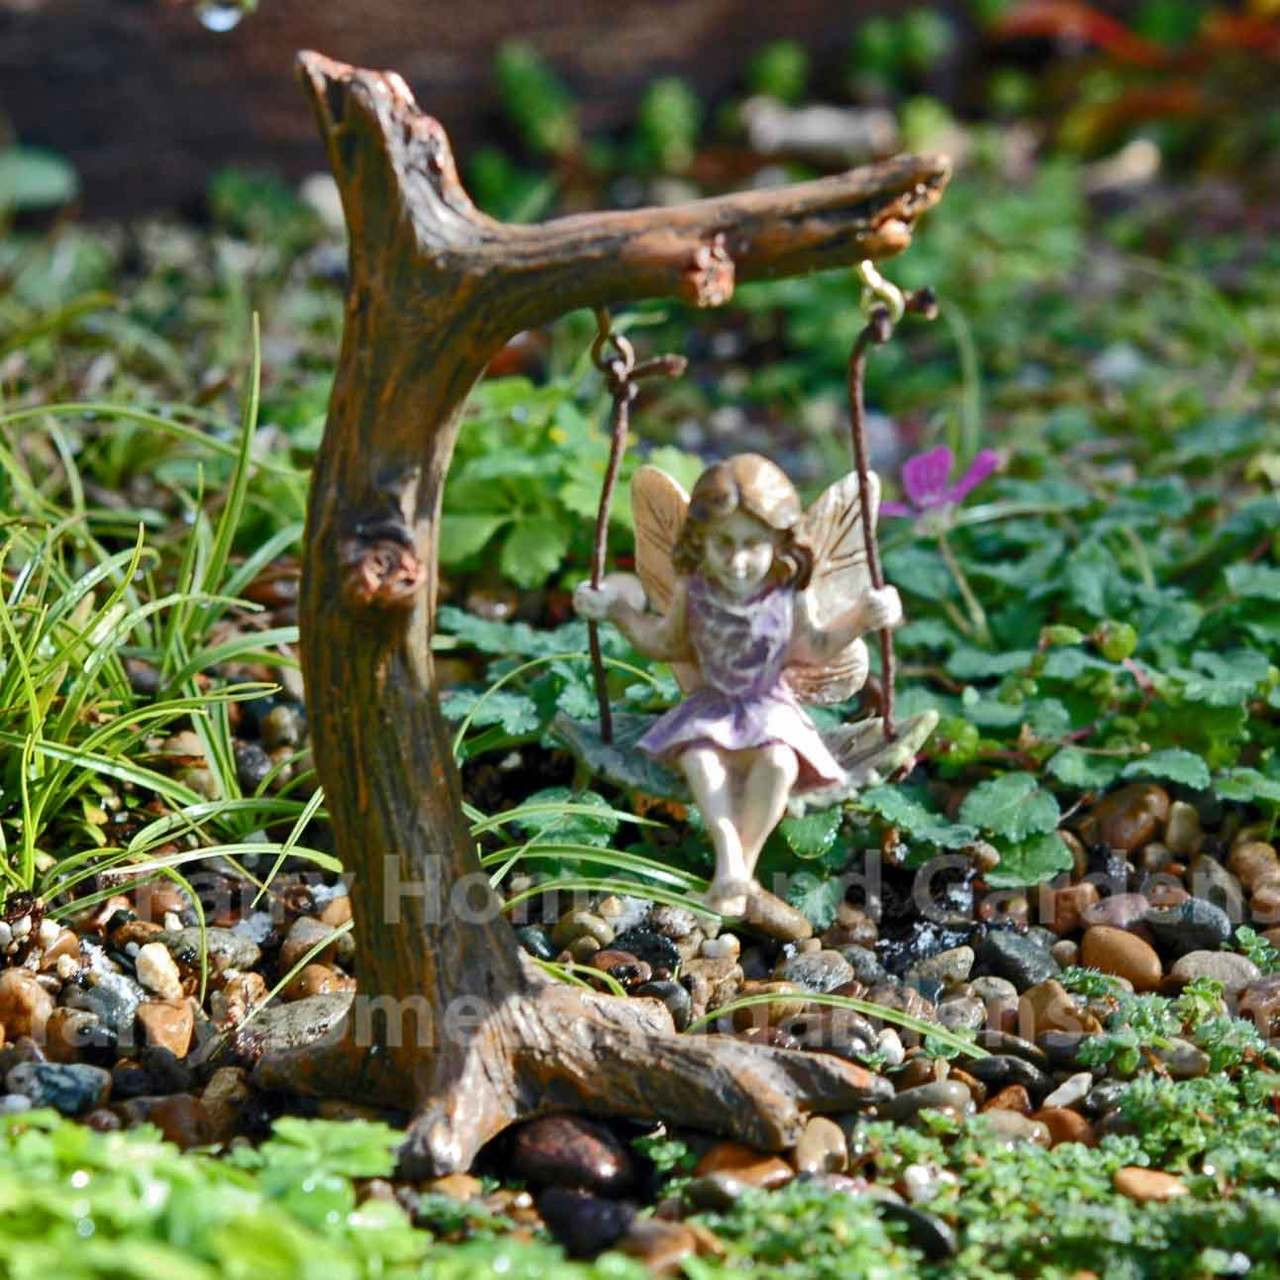 Fairy Garden Fairies Free Shipping On Orders Over 100 00